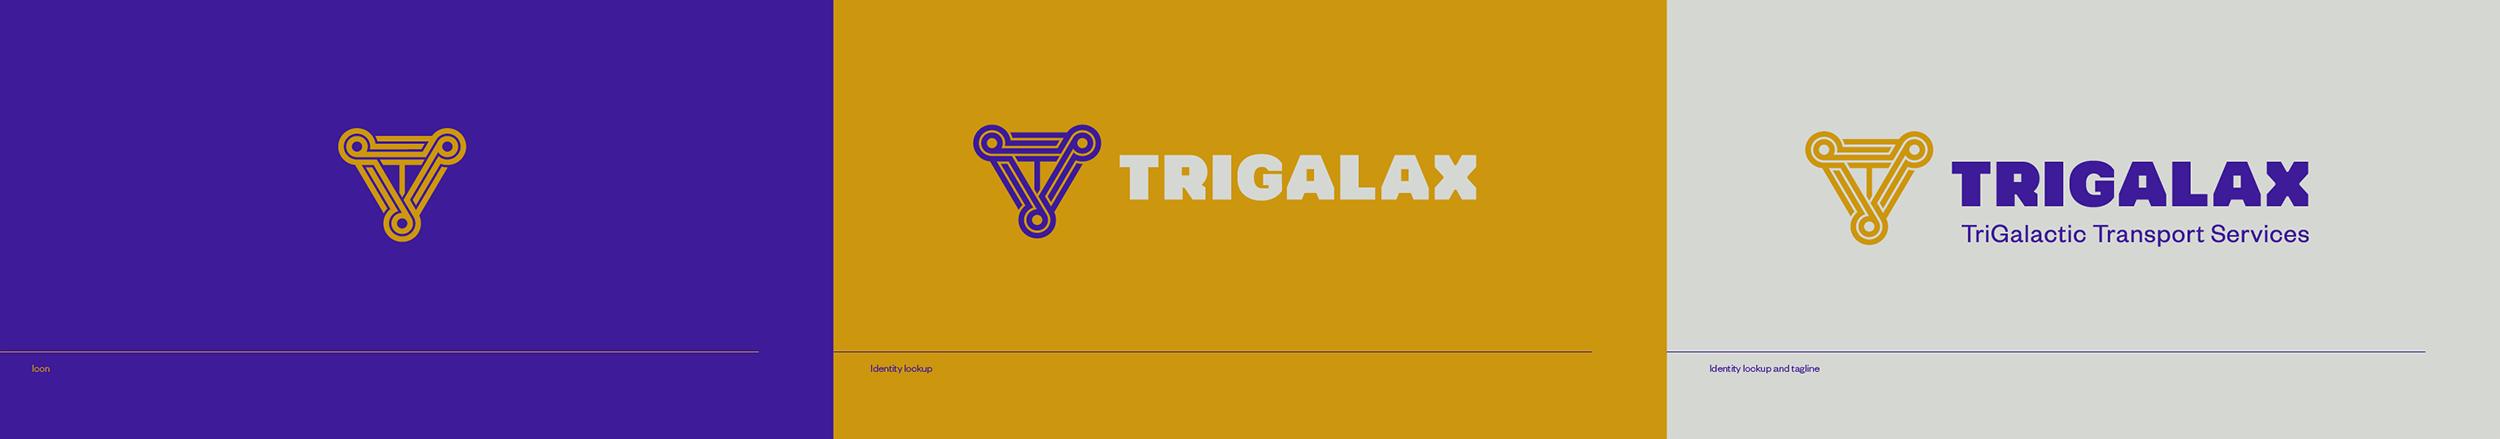 07_Trigalax-Space-Branding-logo-lockups